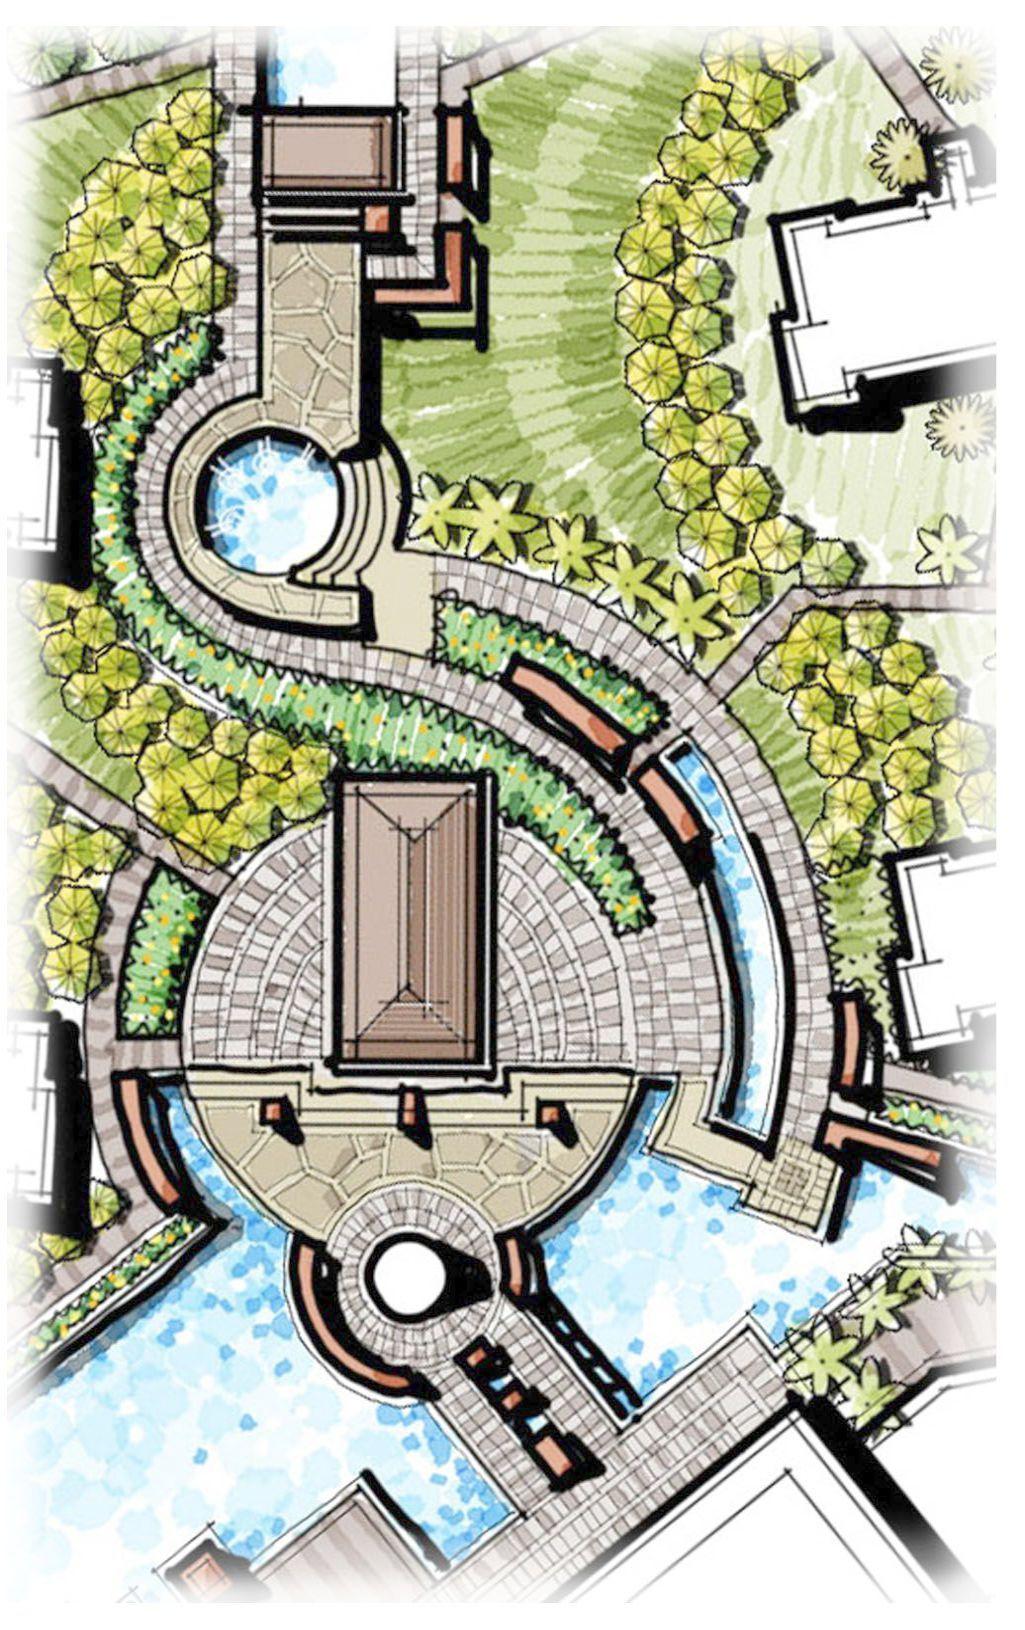 Landscape Design Tool Or Landscape Gardening Course Dunstable Without Entr Landscape Architecture Plan Landscape Architecture Drawing Landscape Design Drawings